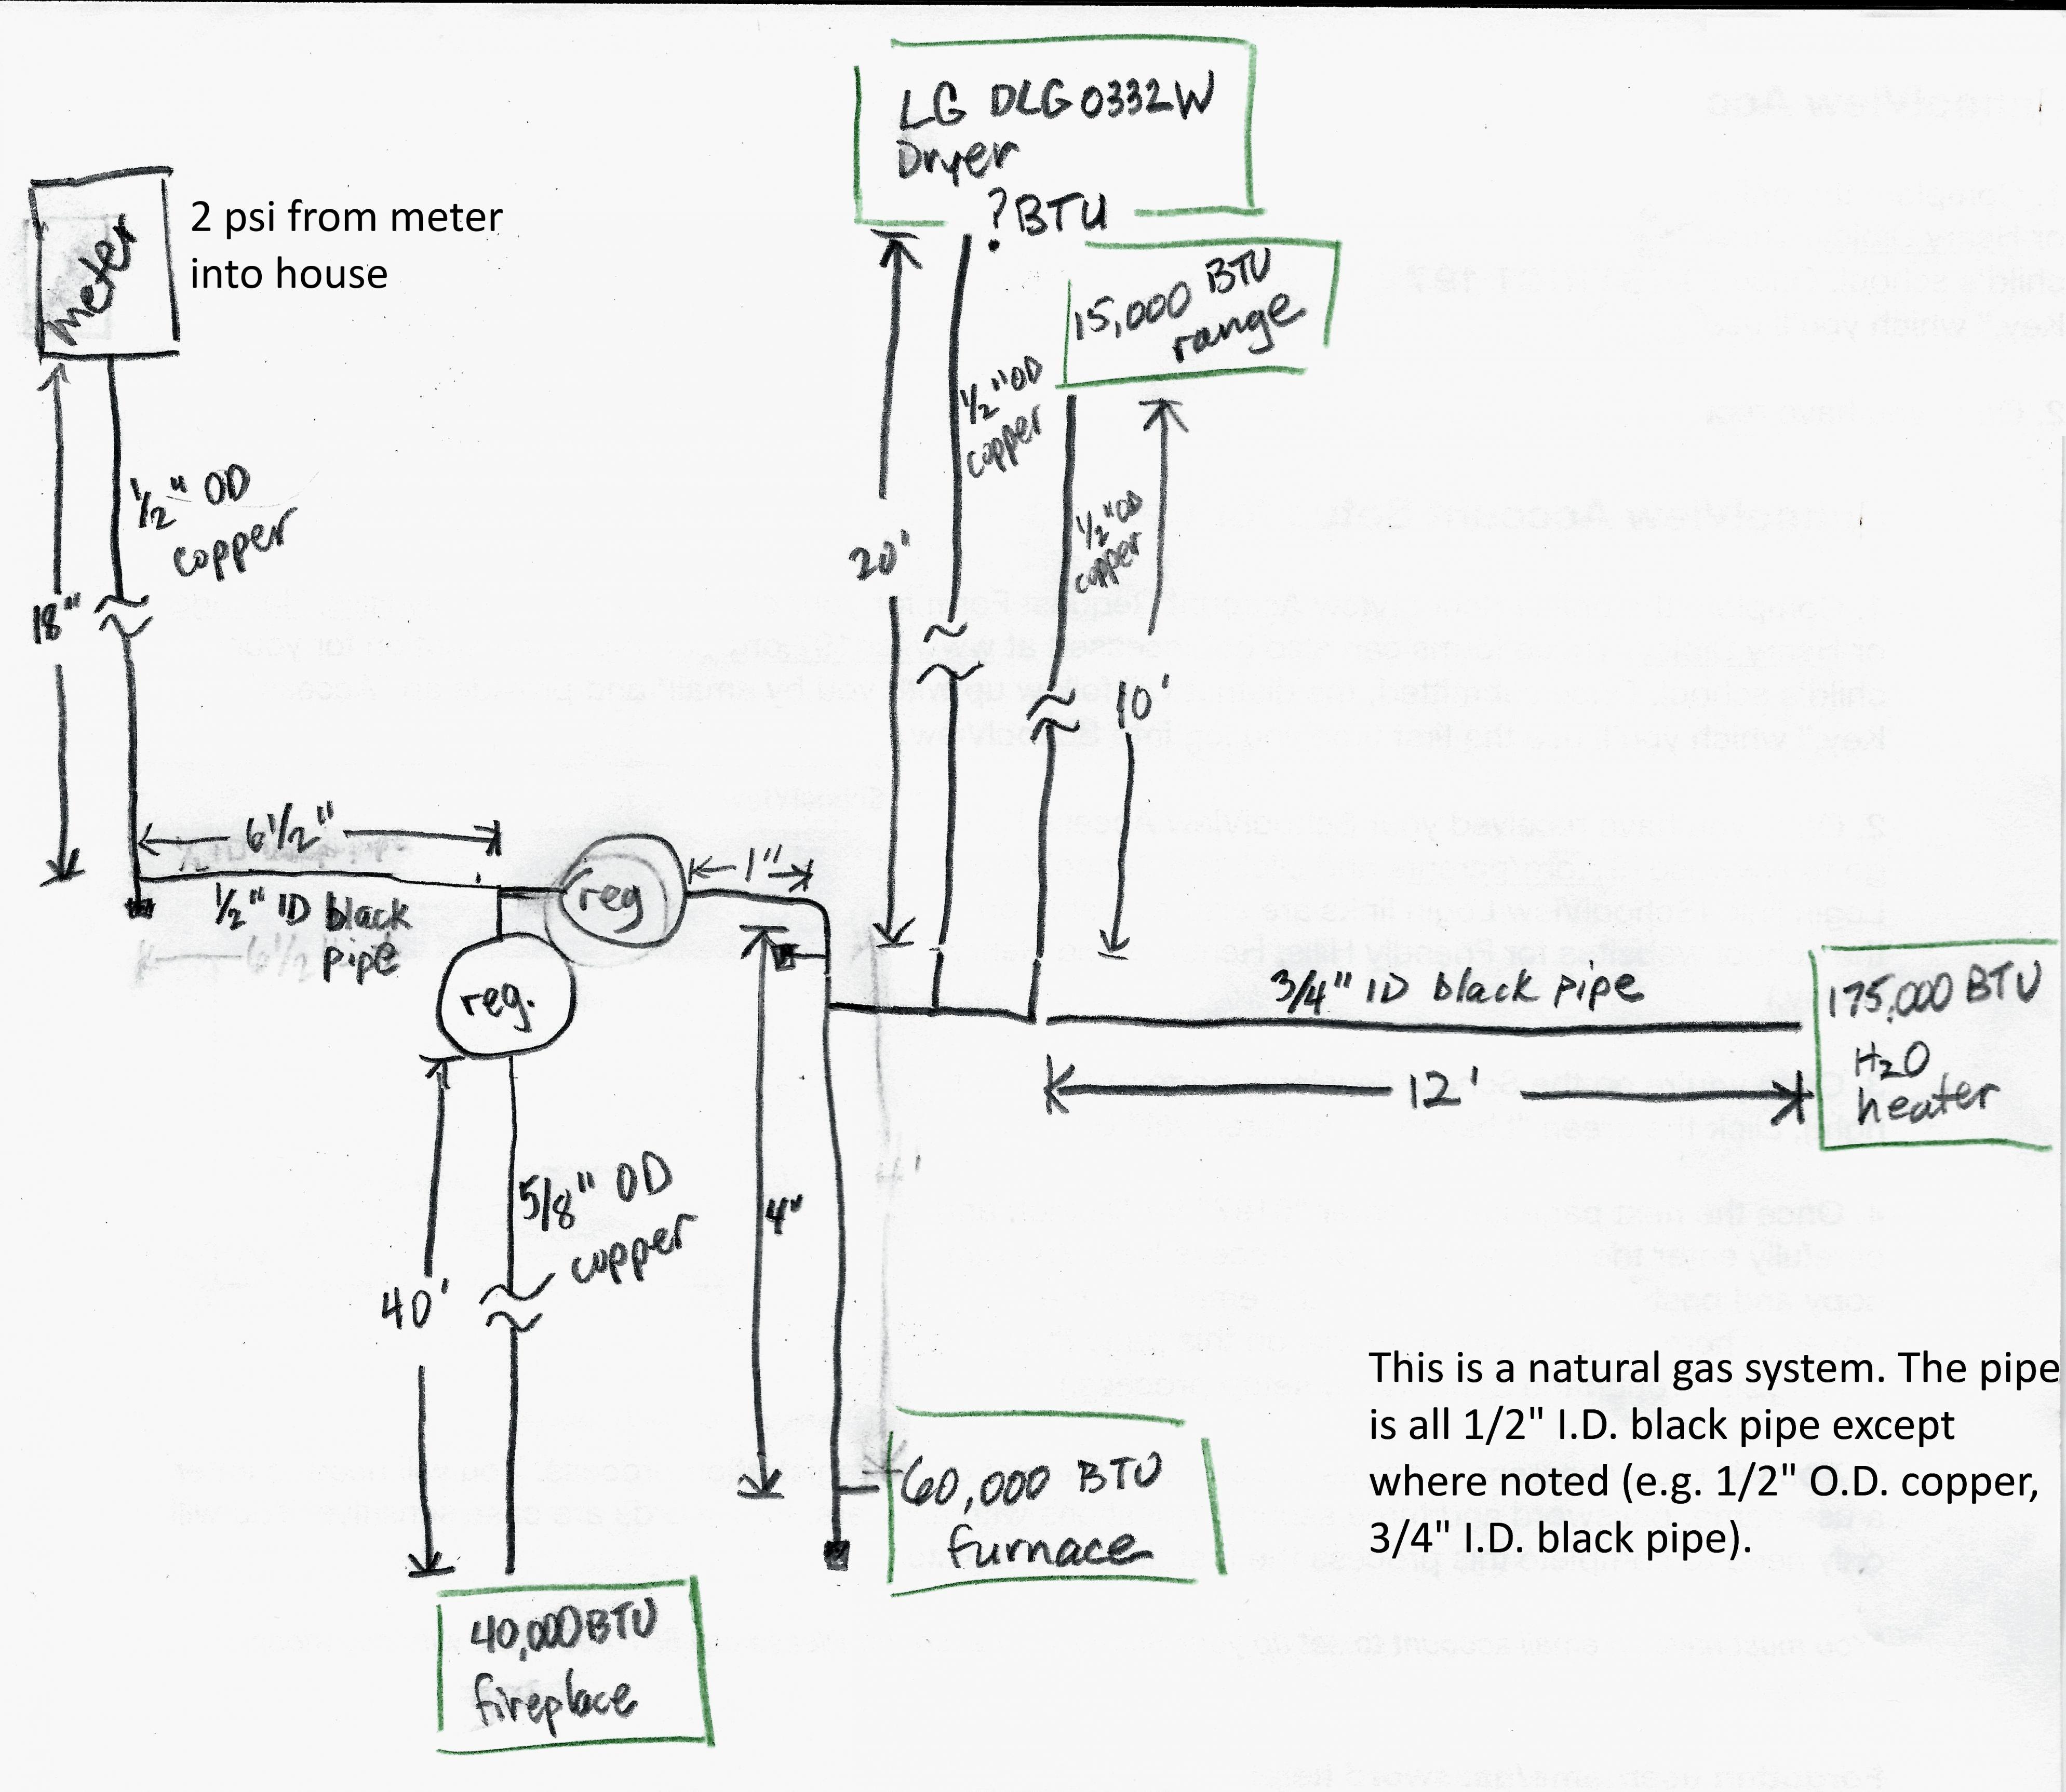 Whole House Wiring Diagram whole House Vacuum System Plumbing Diagram Wiring Wiring Diagrams Of Whole House Wiring Diagram